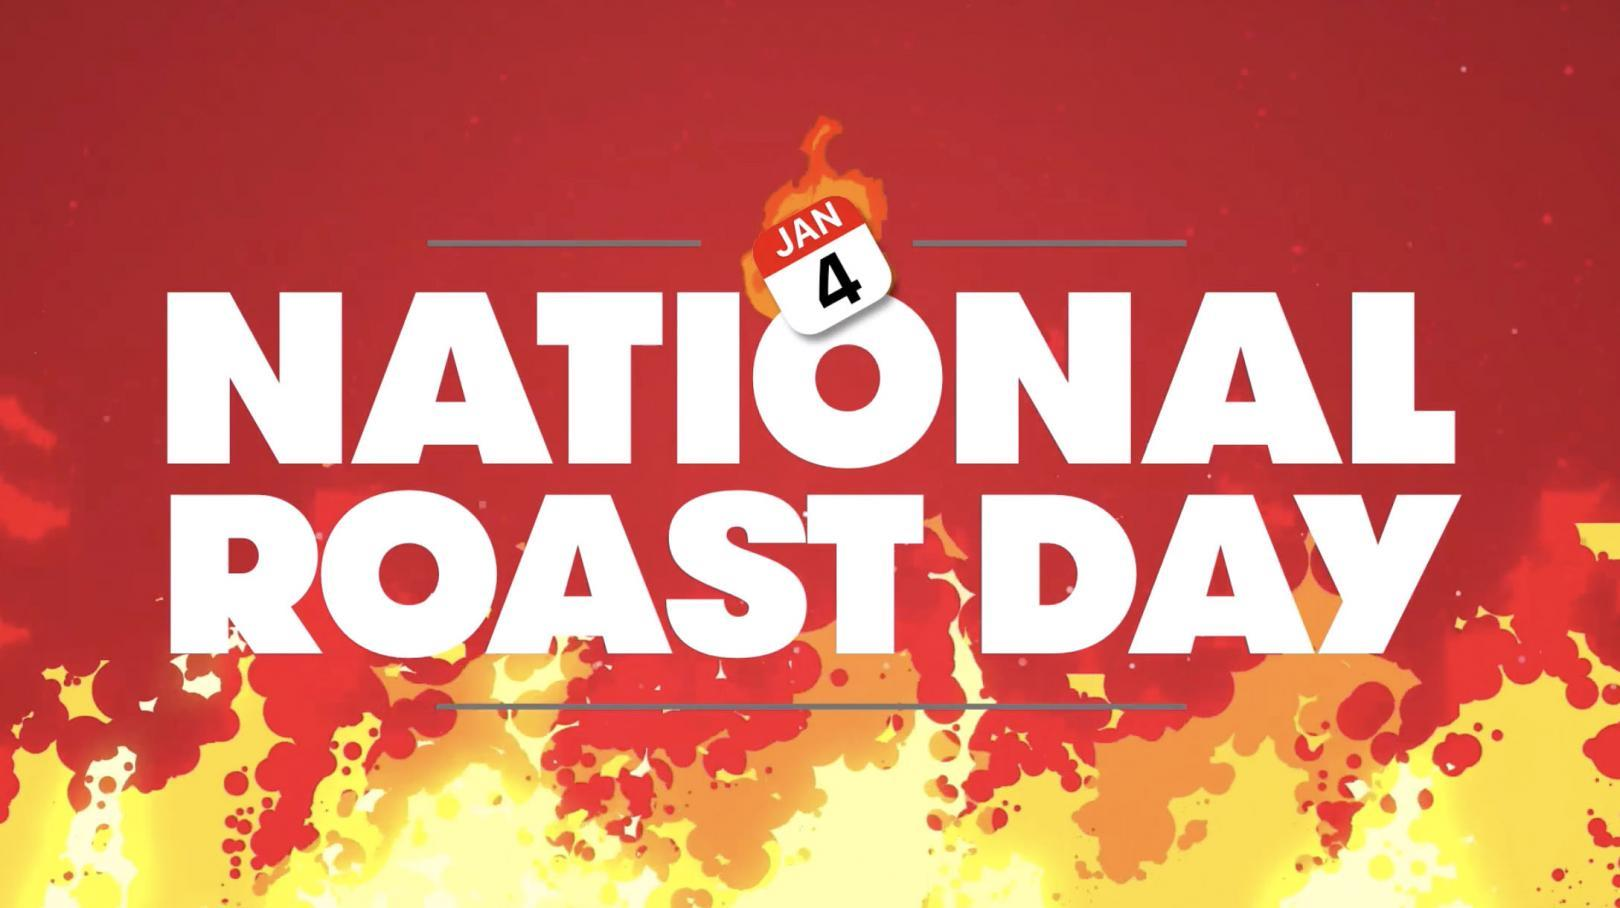 #NATIONALROASTDAY